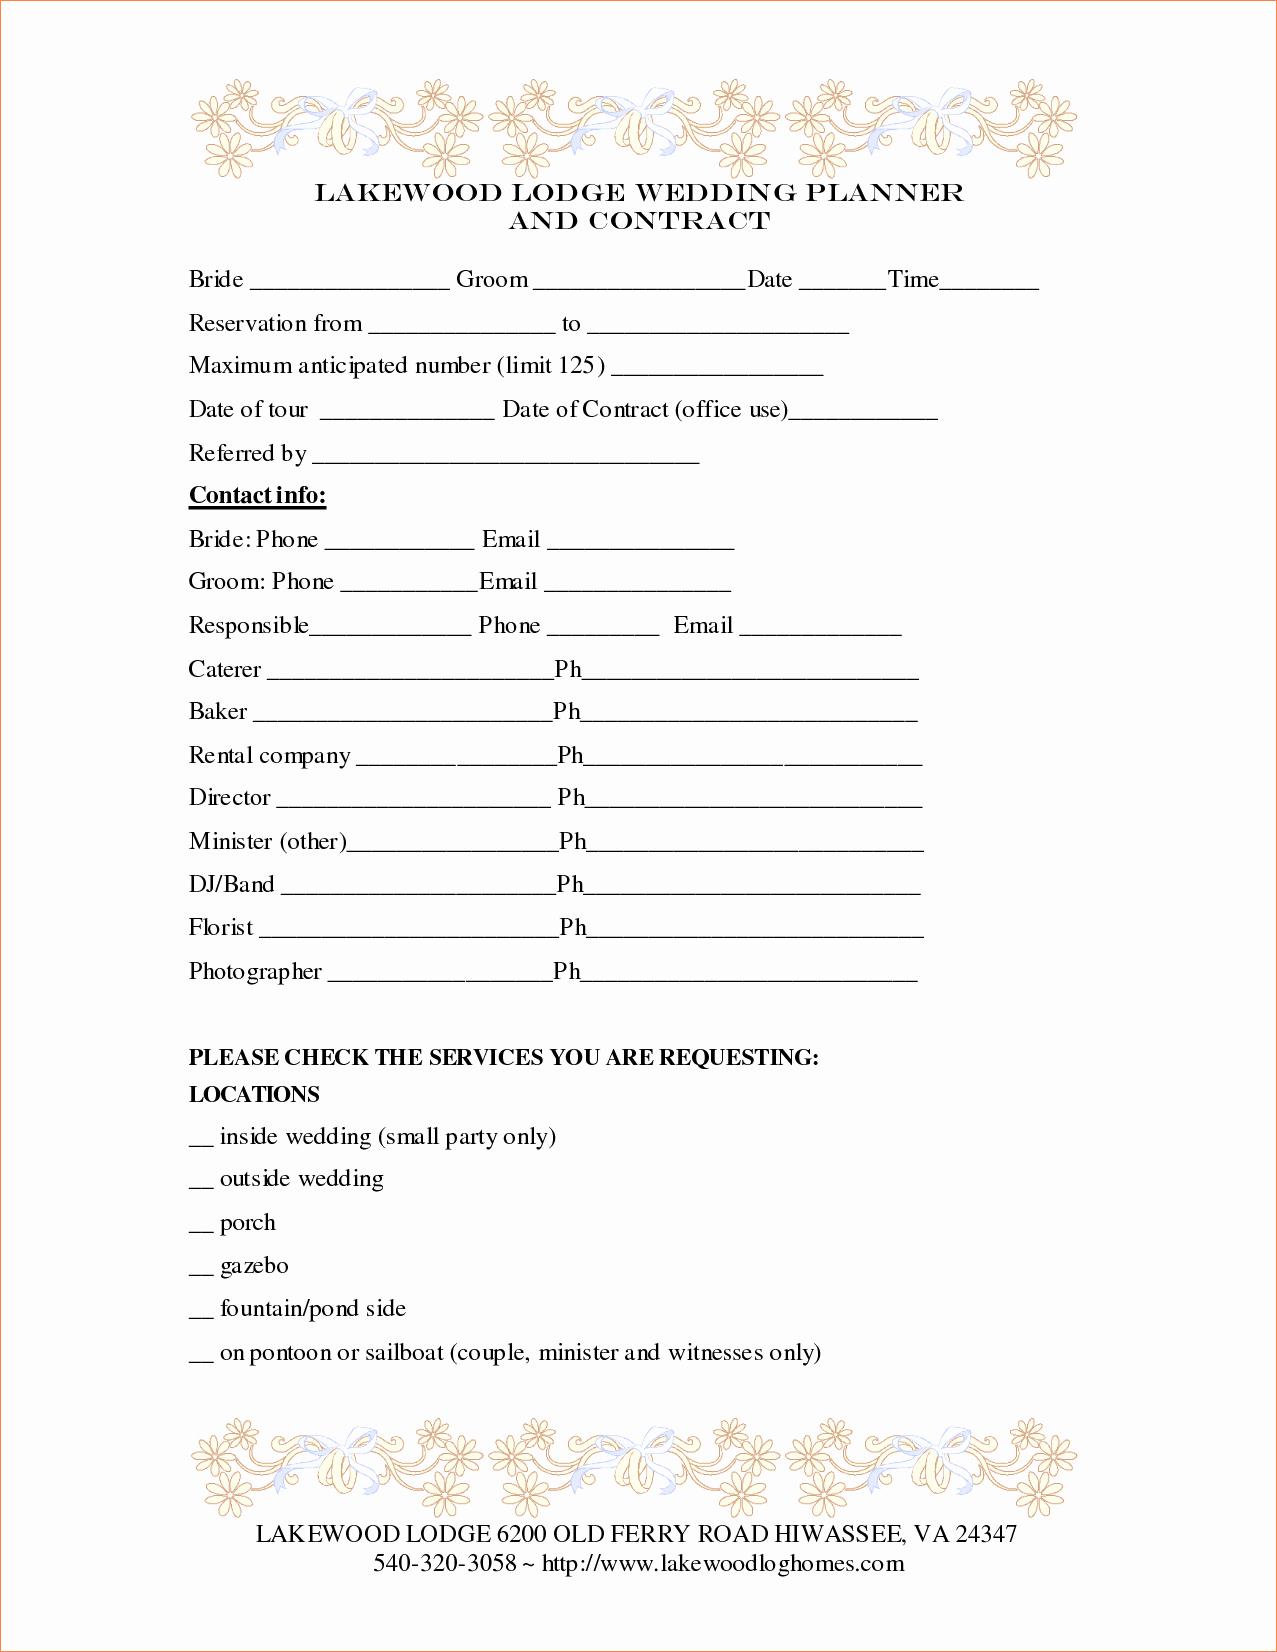 3 Wedding Contract Templatereport Template Document